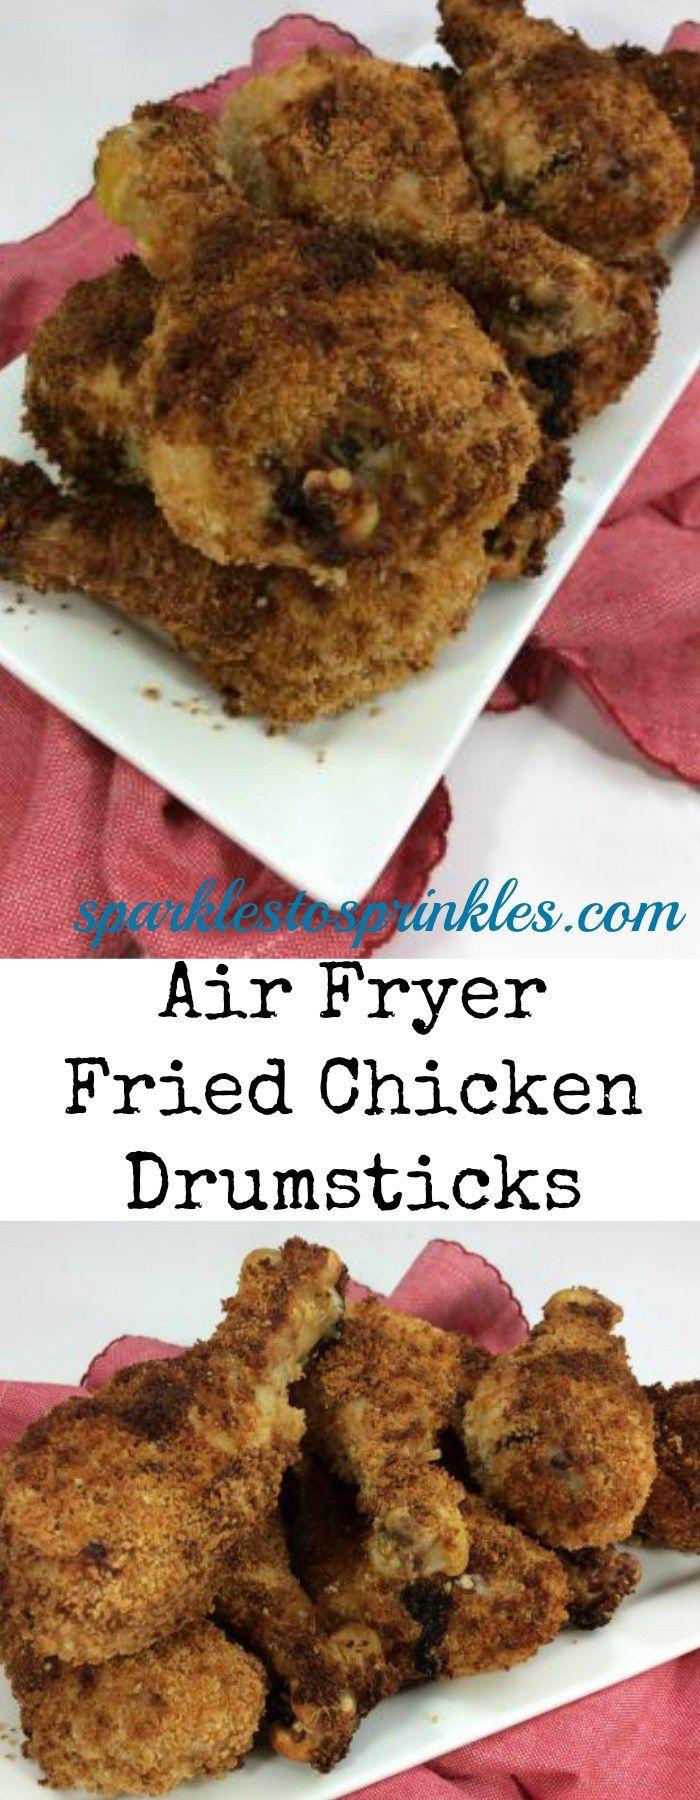 Air Fryer Fried Chicken Drumsticks Recipe Air fryer